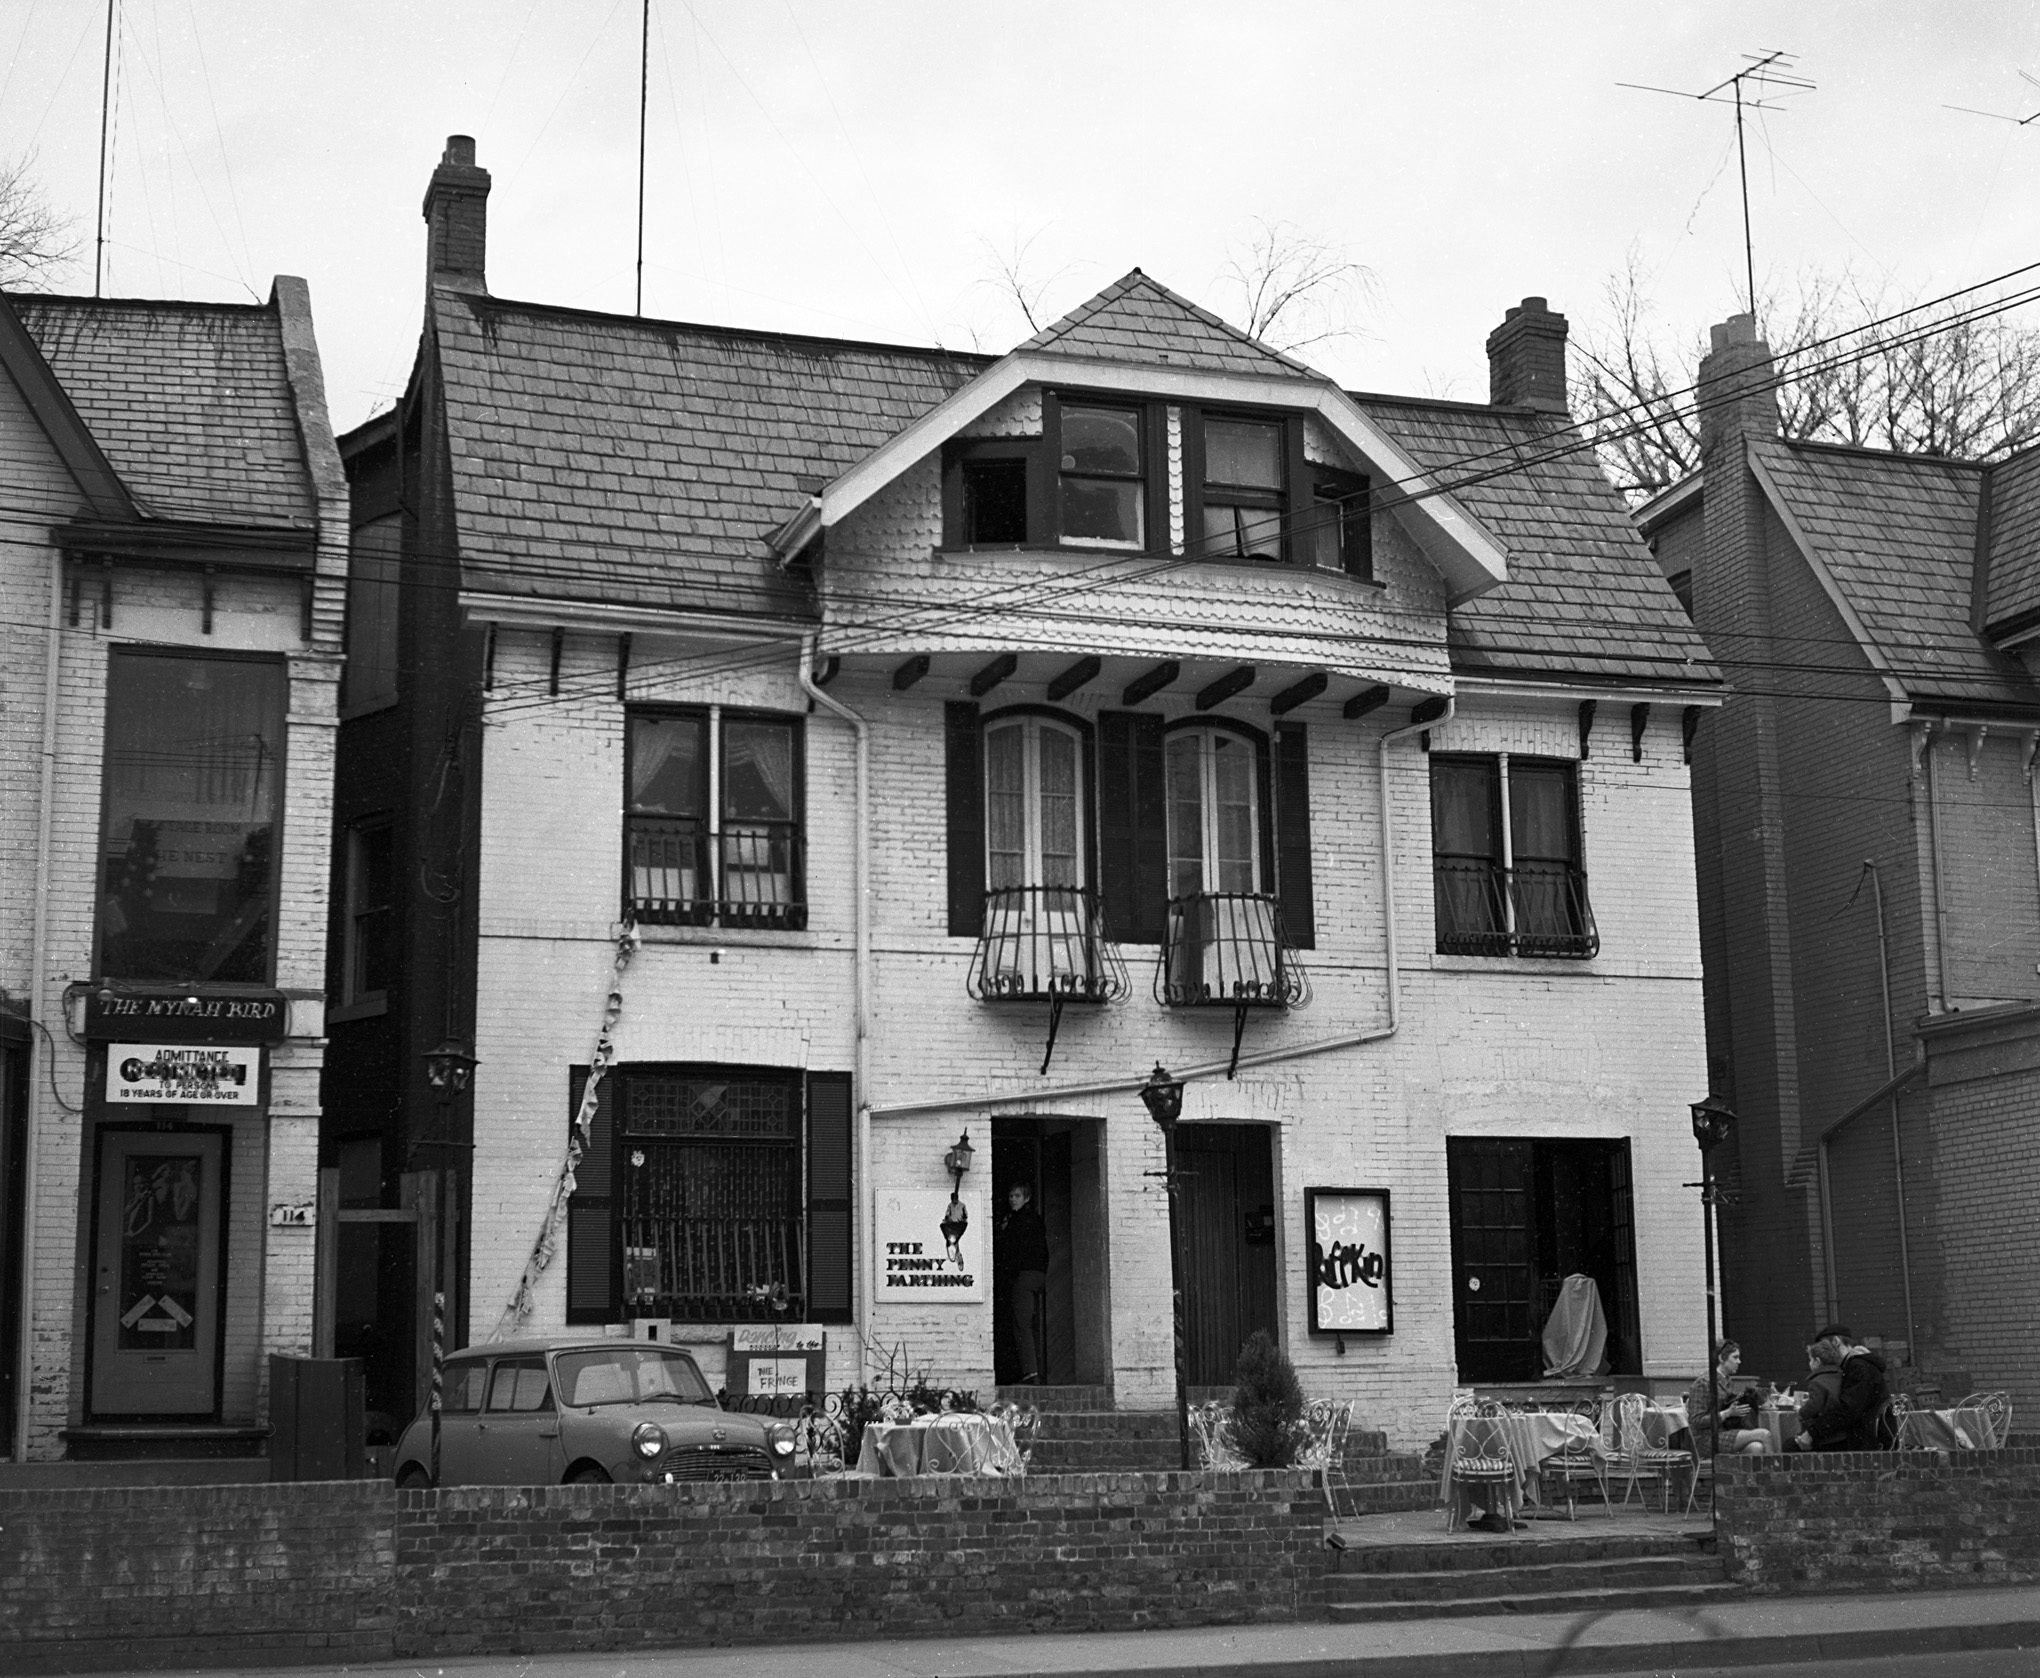 Toronto 1968 - 1973: Places - 1